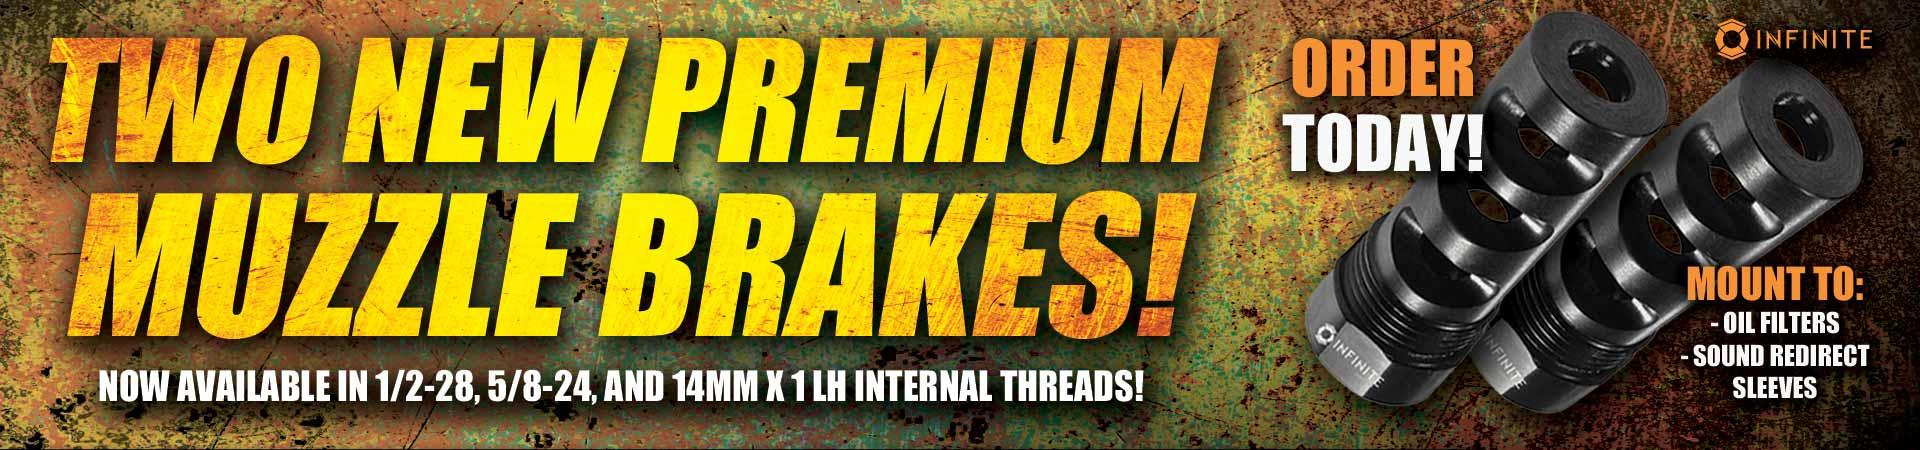 Two New Premium Muzzle Brakes!